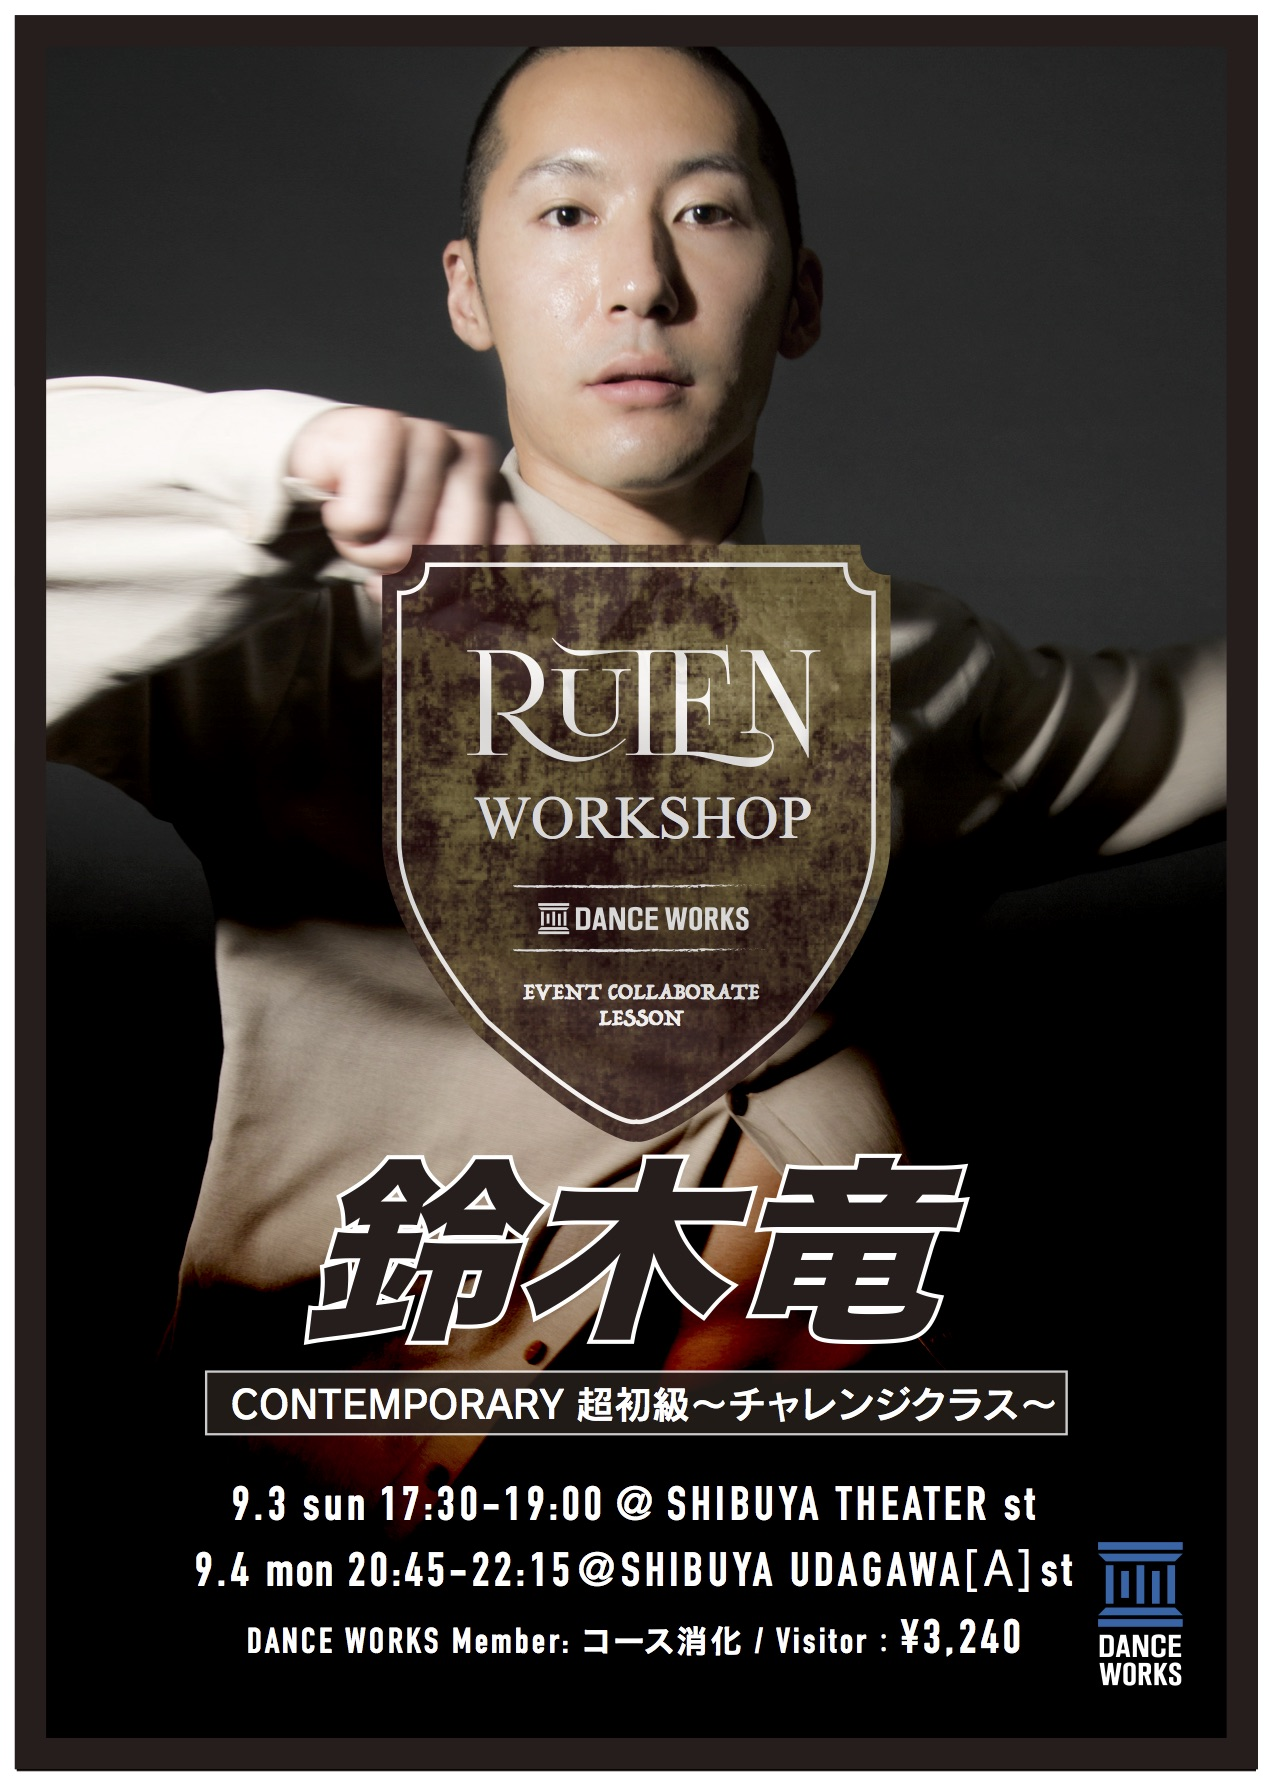 RUTEN_WS_鈴木竜_印刷用